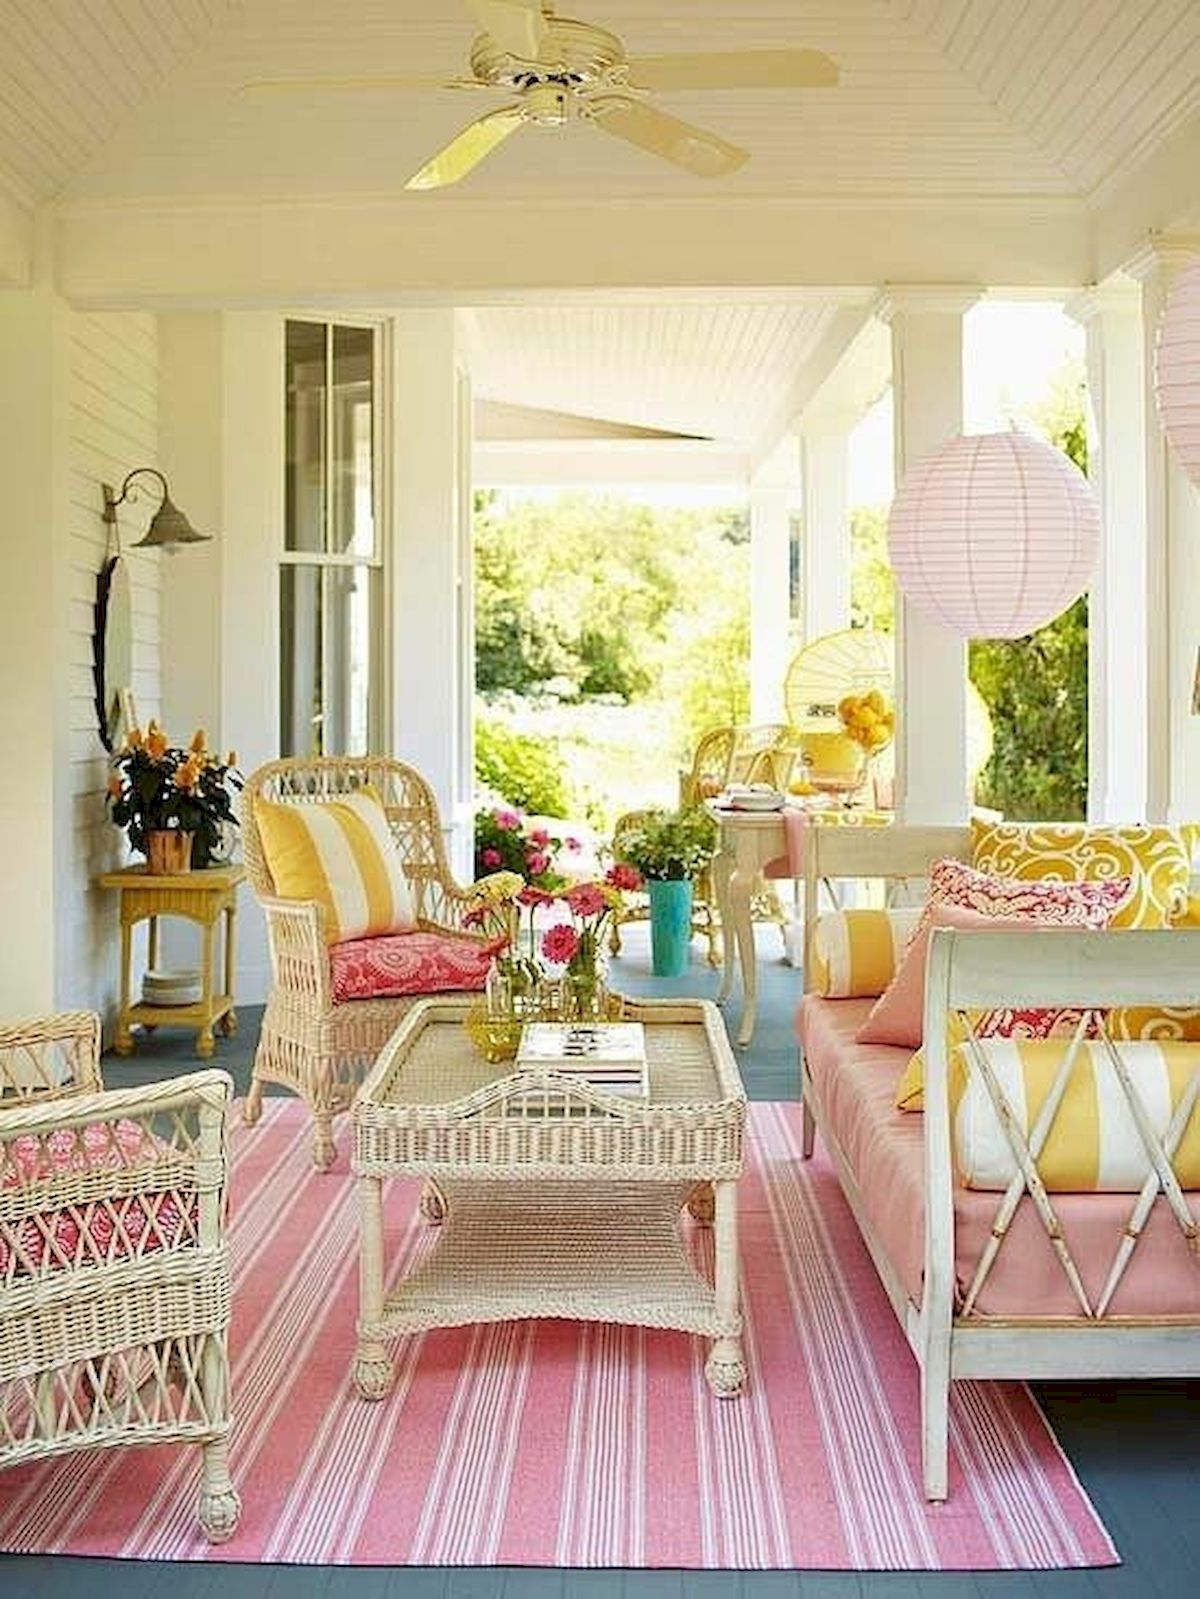 45 Colorful Interior Home Design and Decor Ideas (26)